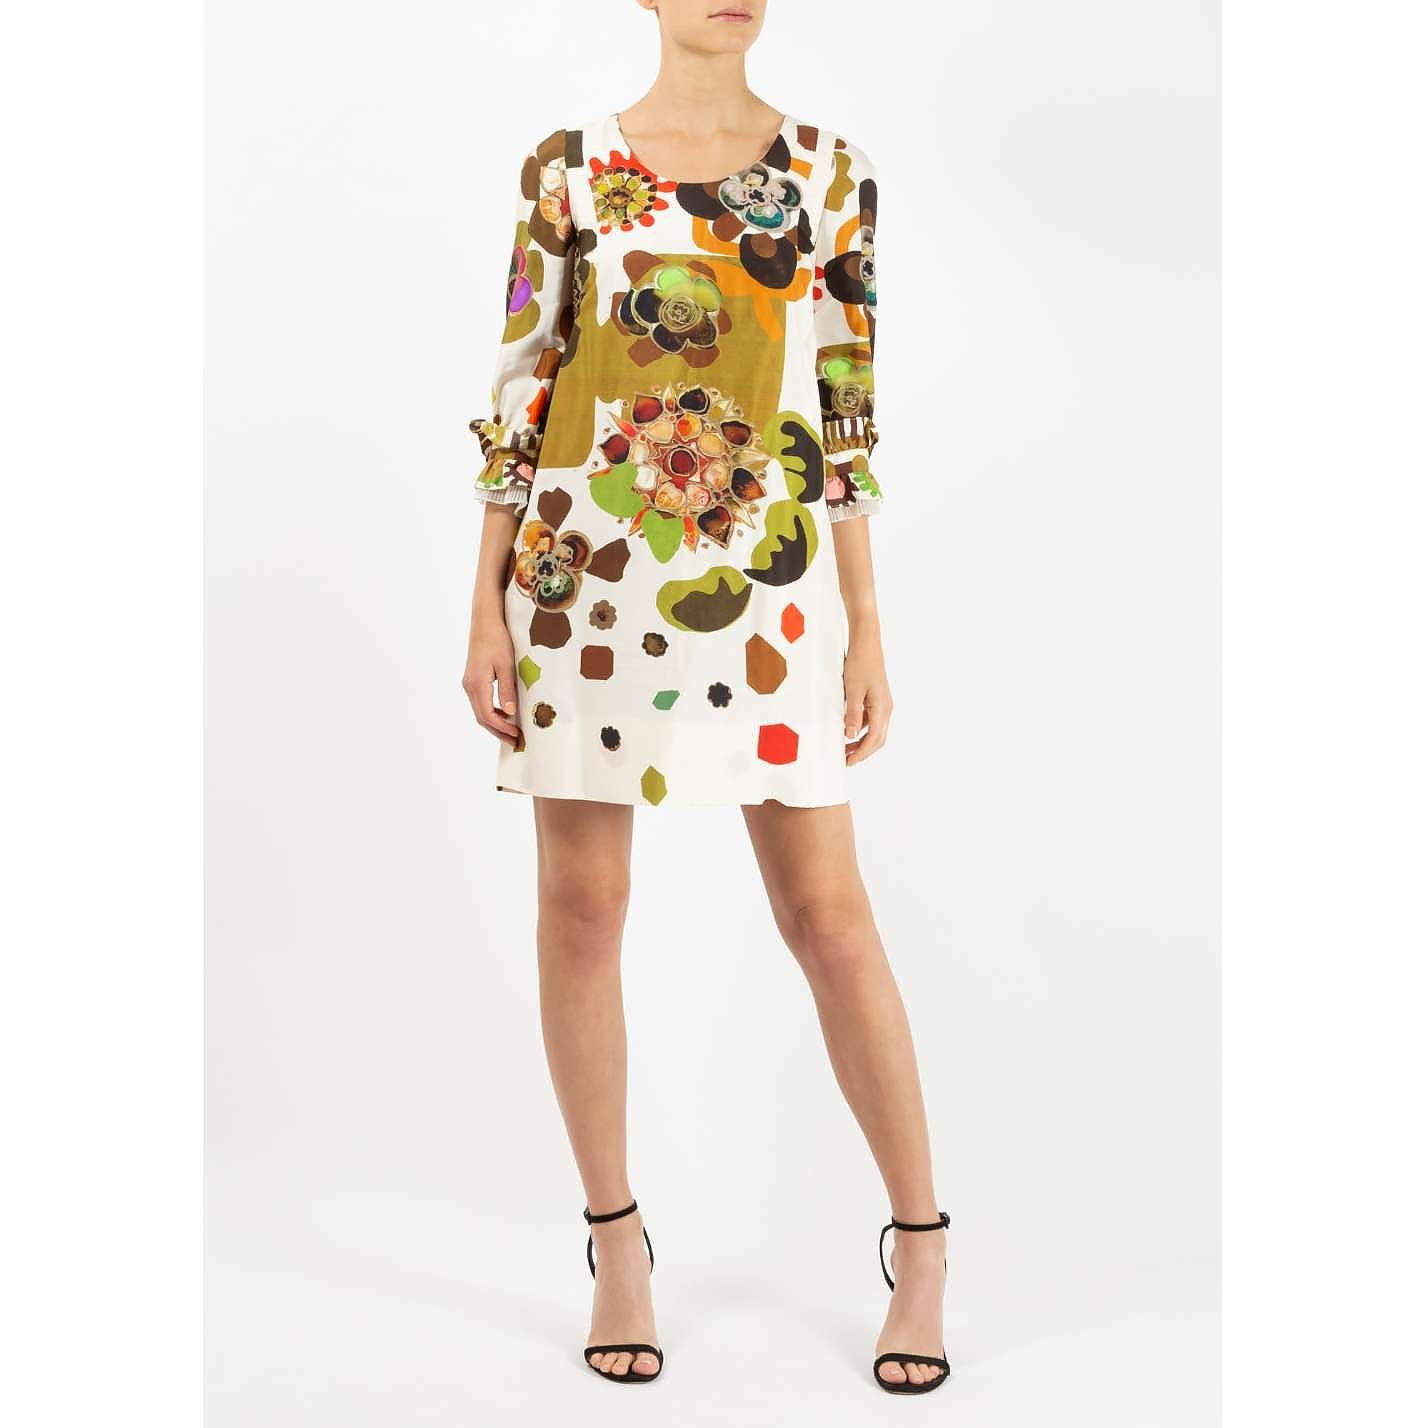 Chloé Floral Print Dress